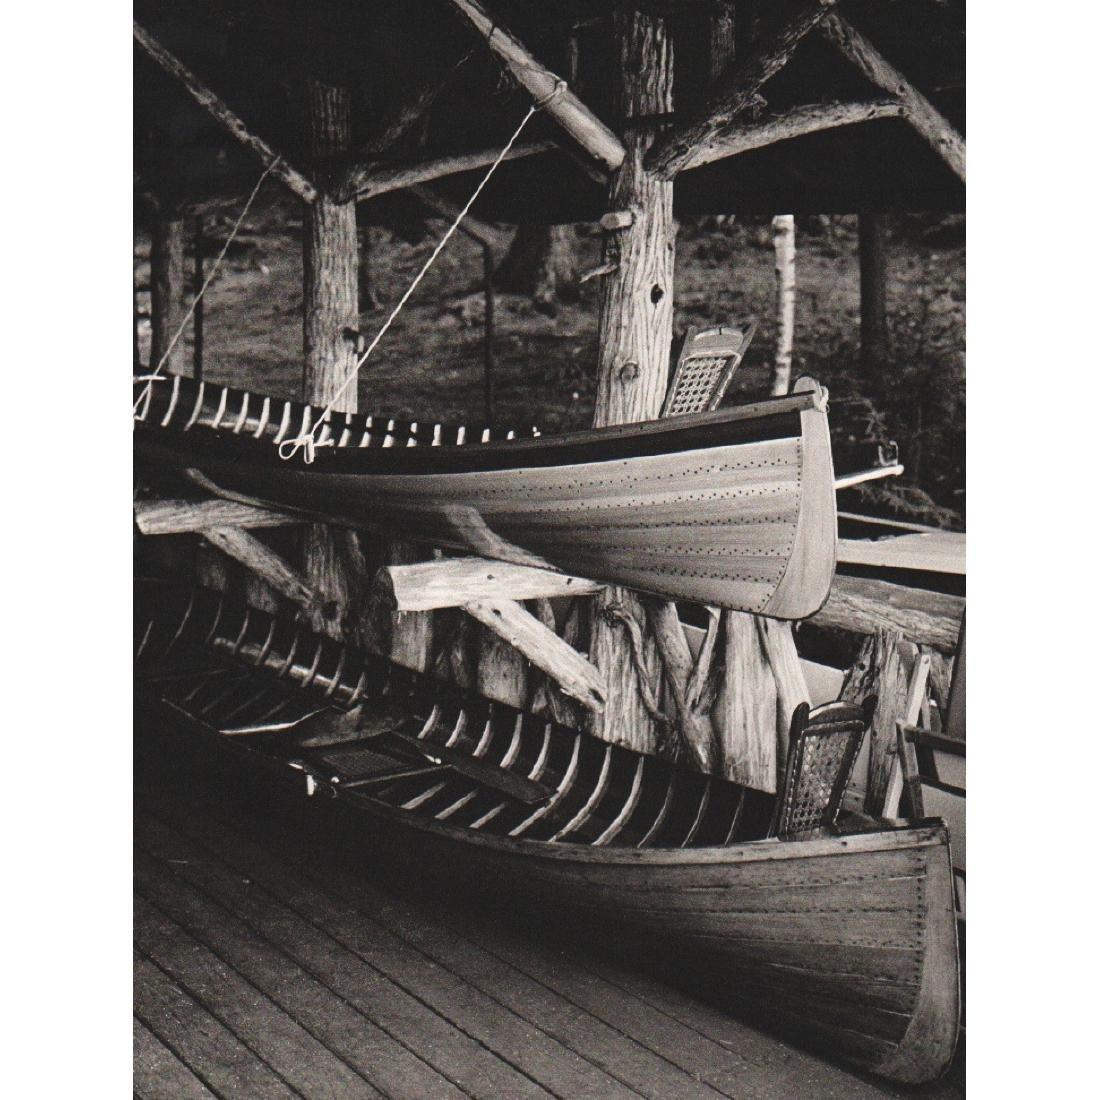 BRUCE WEBER - Guide Boats, Camp Longwood